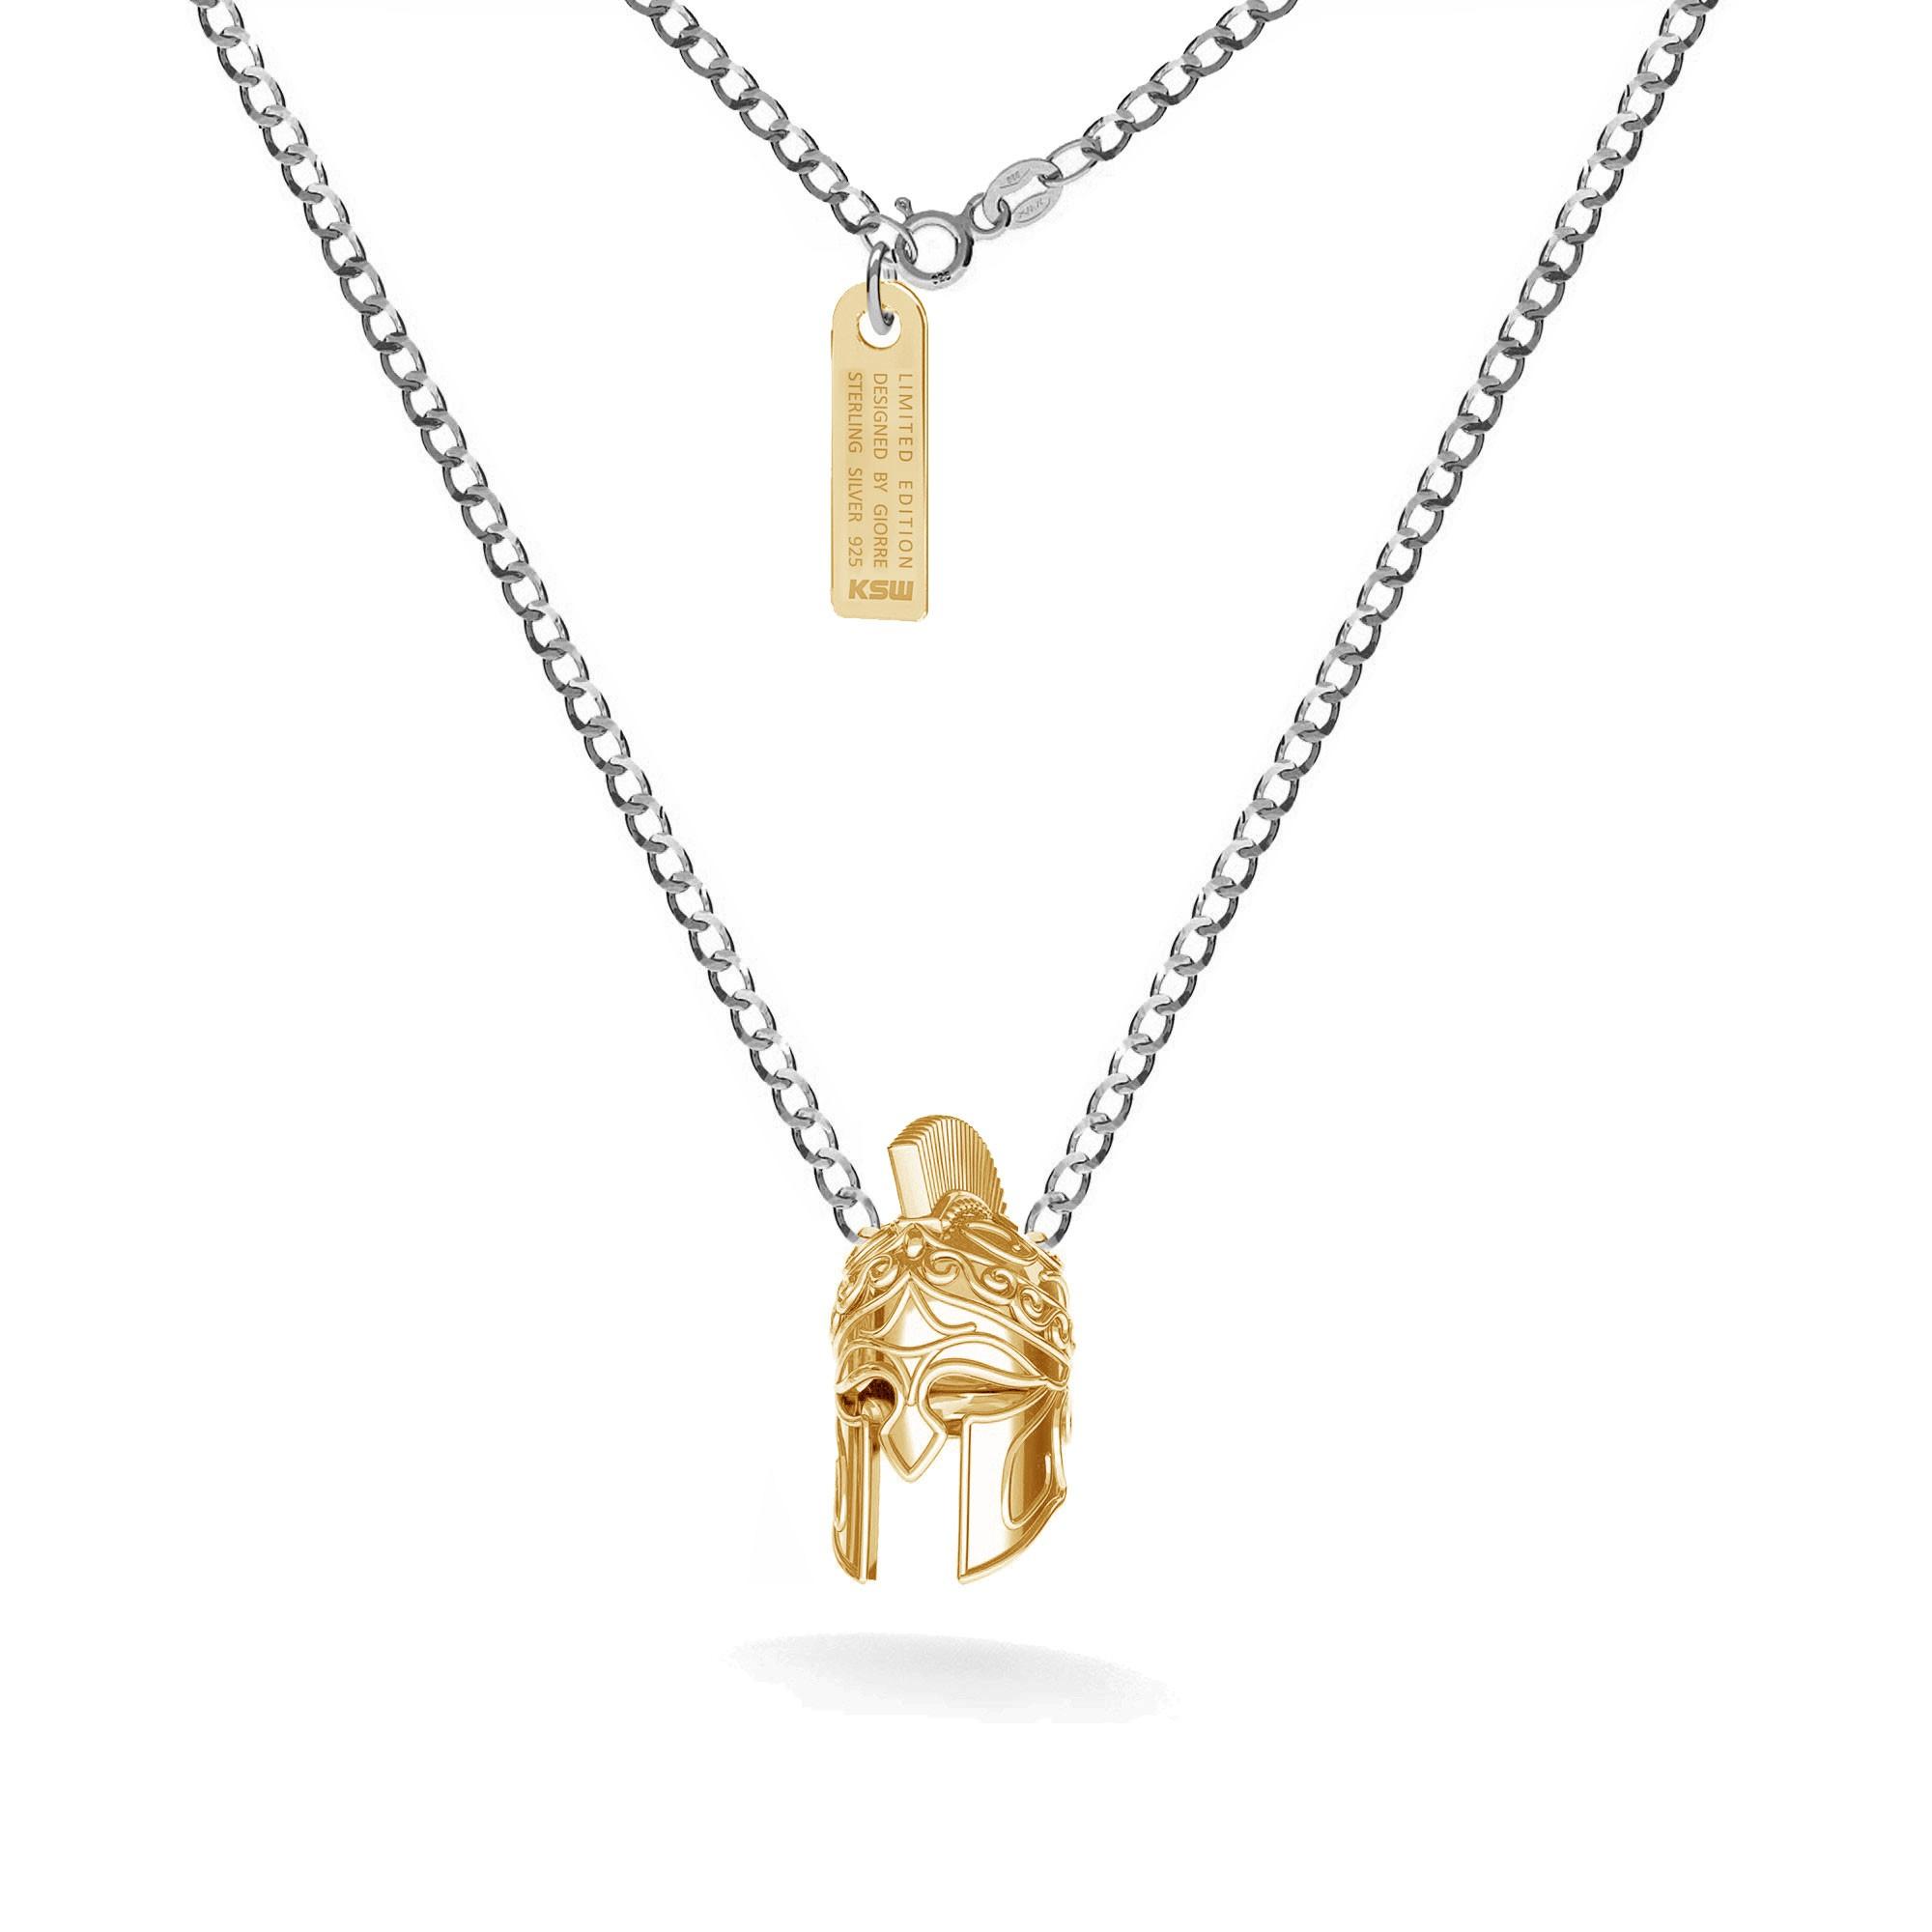 Silver spartan necklace, curb chain, silver 925